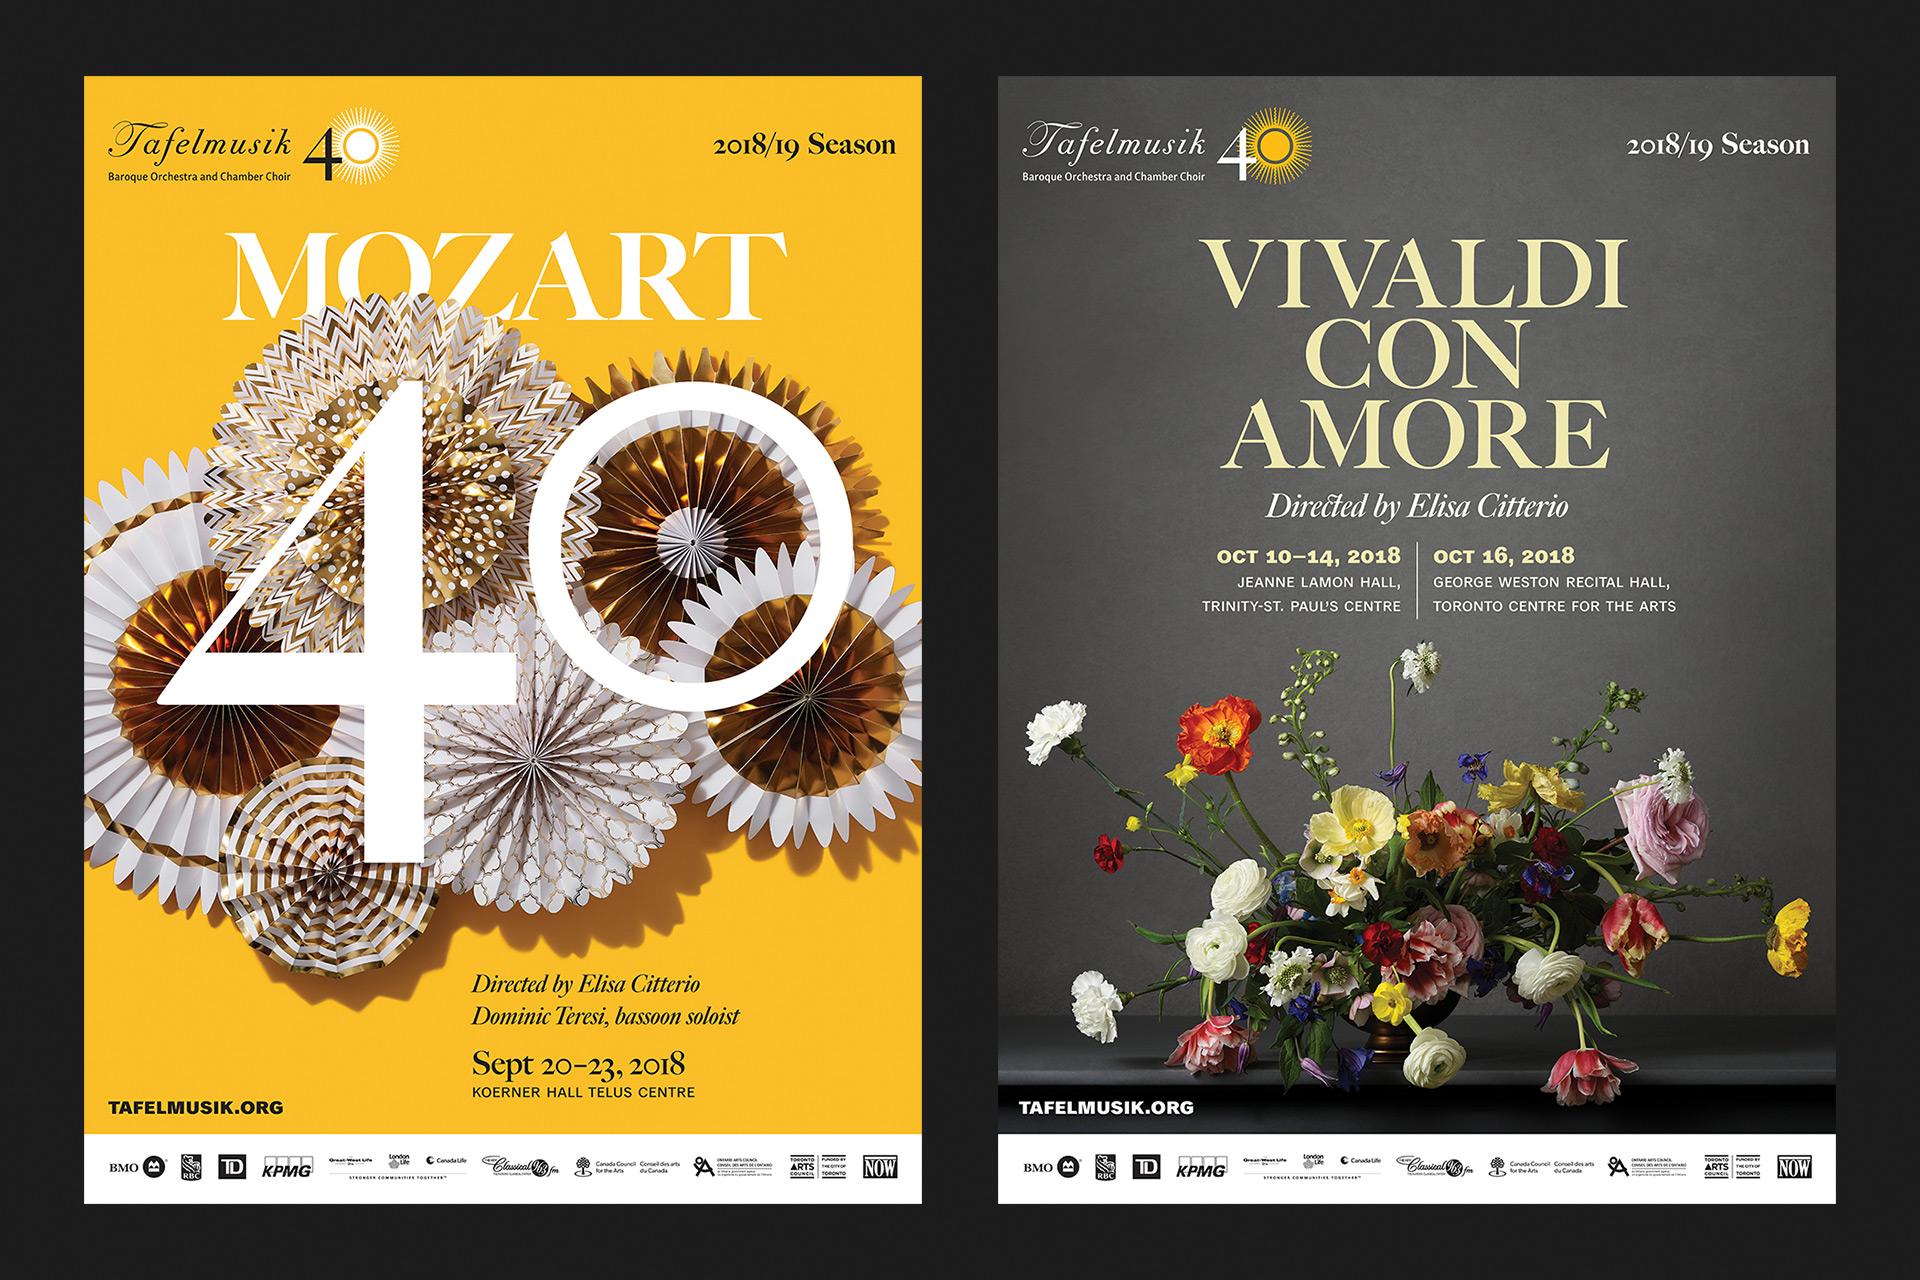 Mozart 40 and Vivaldi Con Amore posters